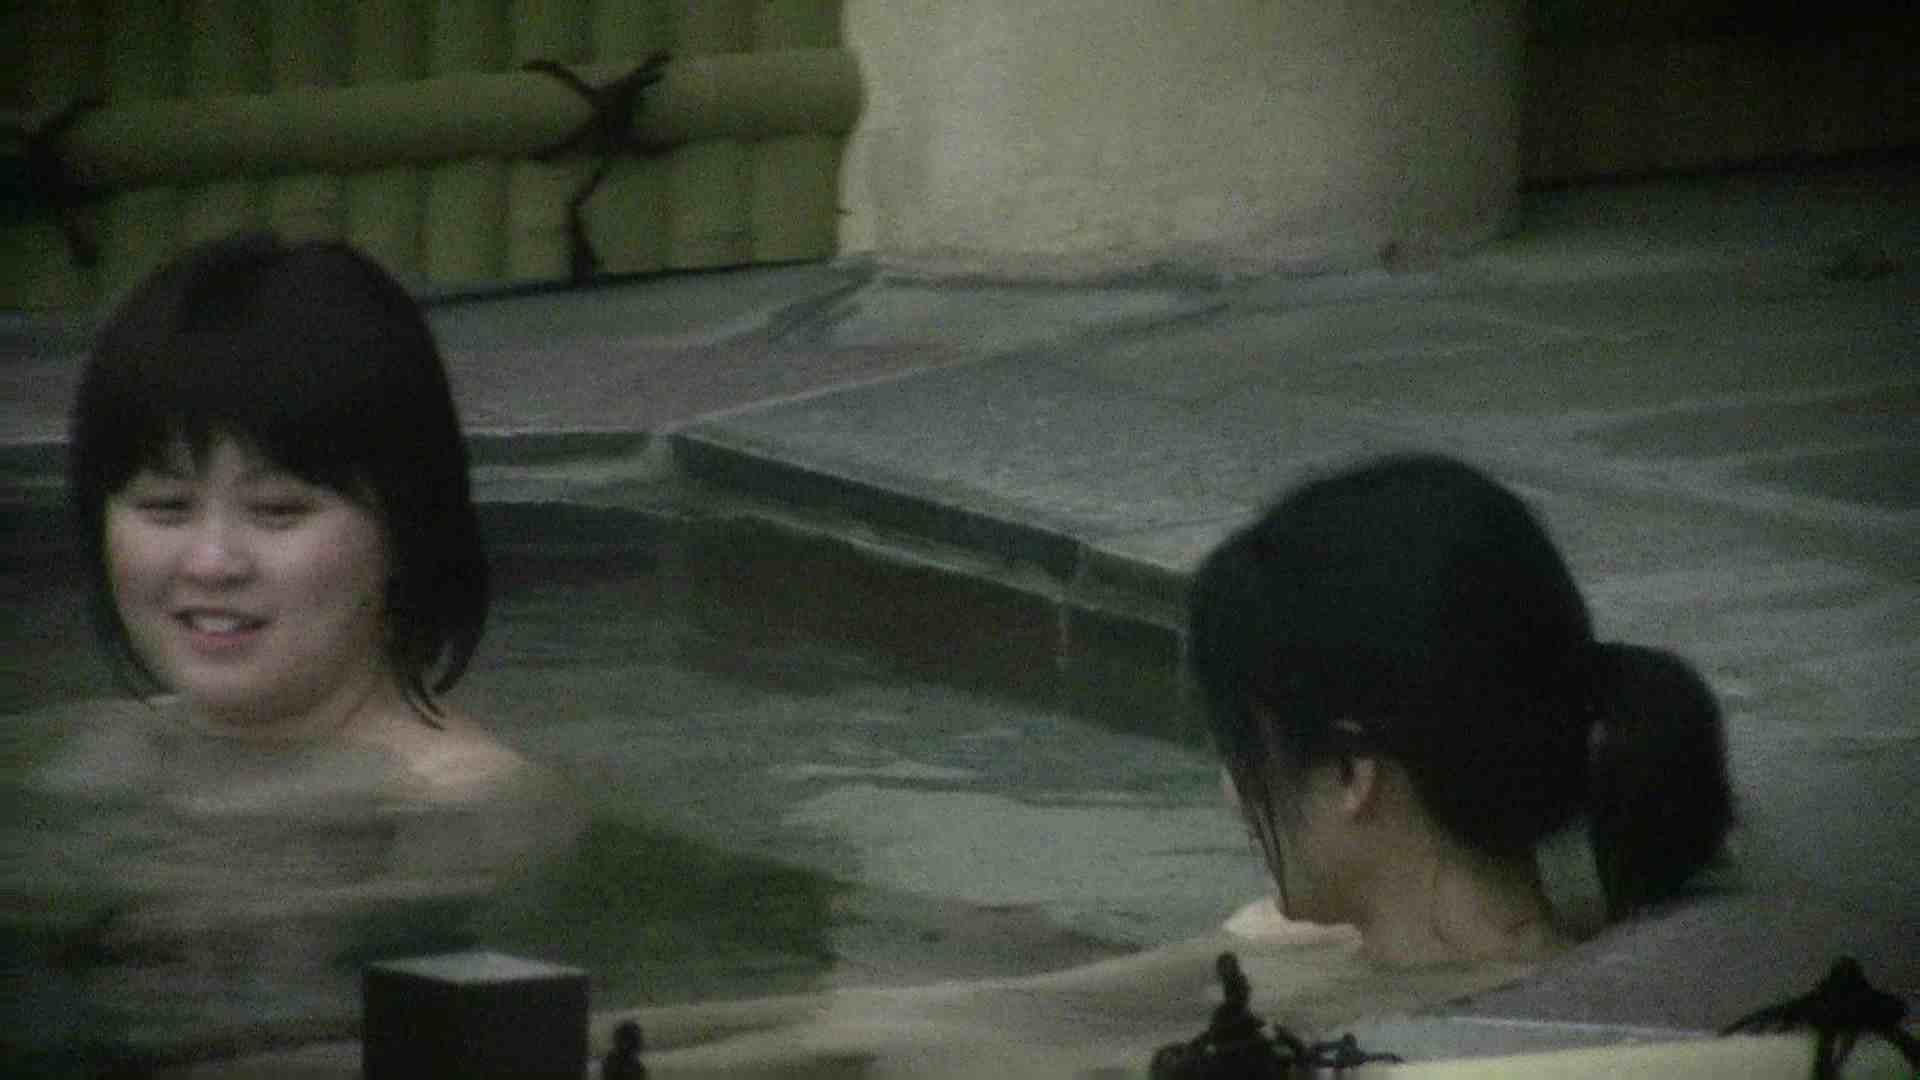 Aquaな露天風呂Vol.539 盗撮  62pic 32